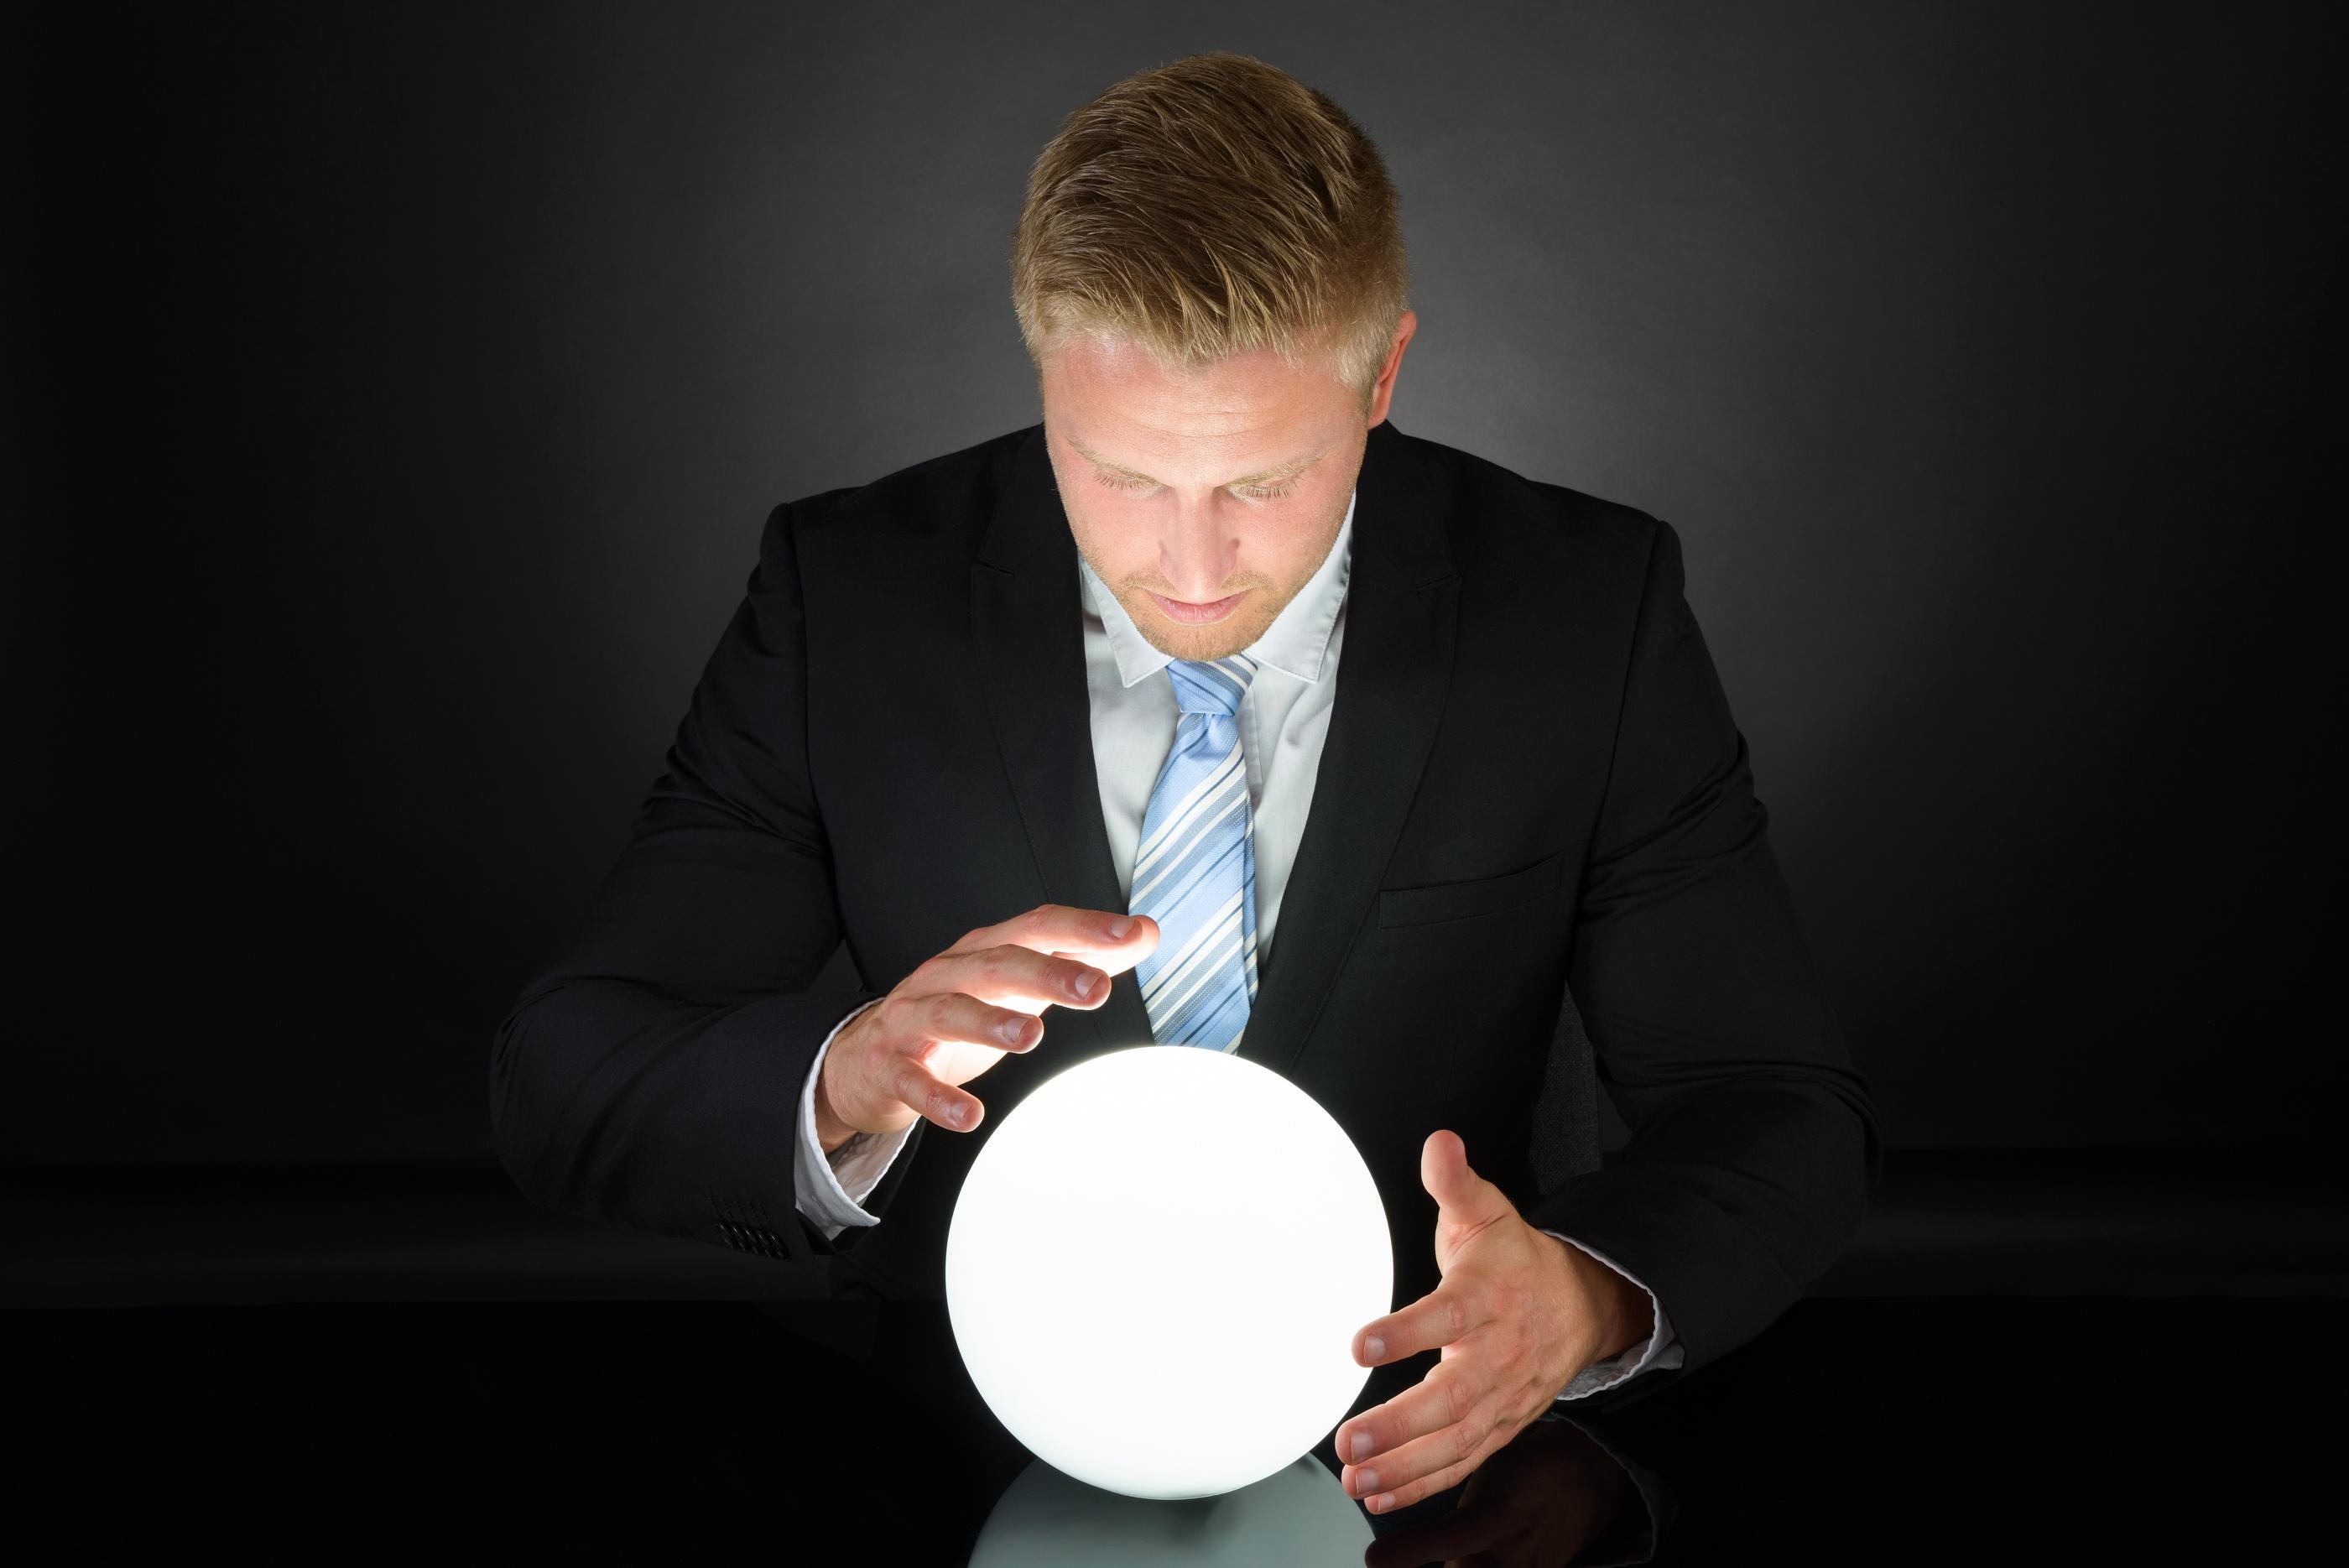 bigstock-Portrait-Of-Businessman-With-C-80860418.jpg